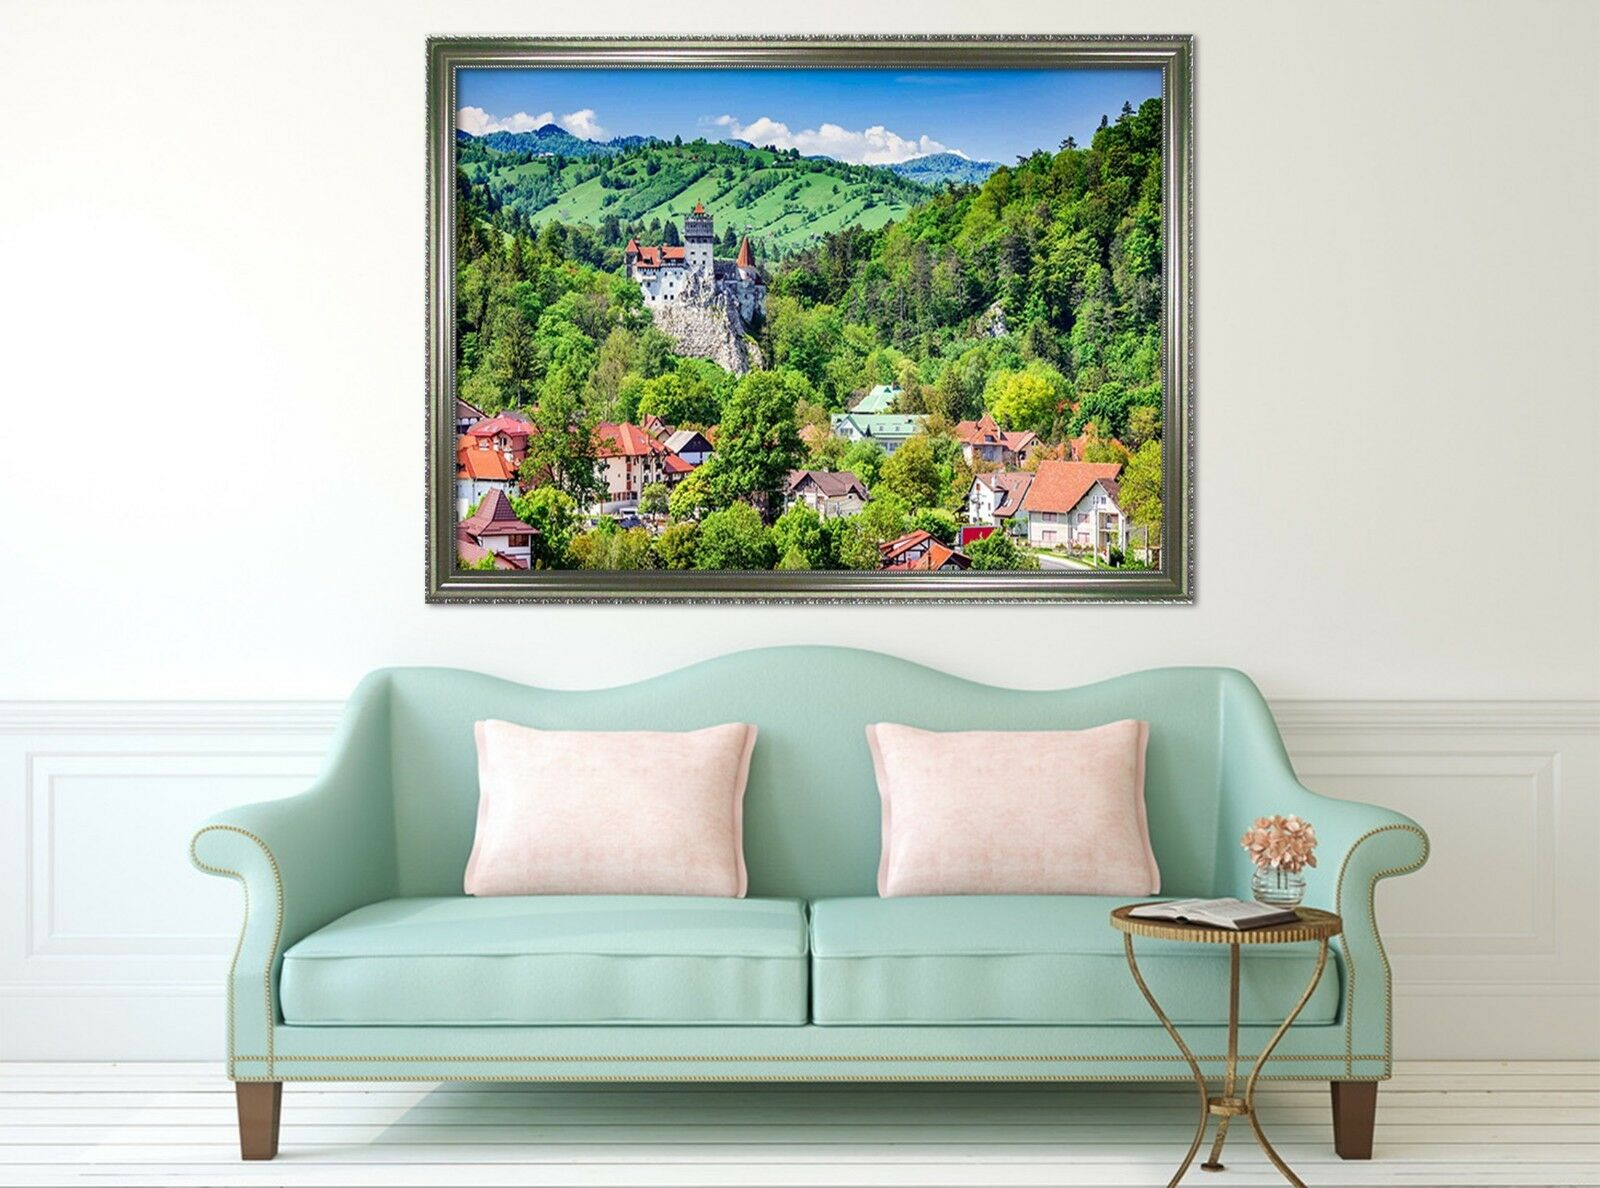 3D rojo House verde Woods 1 Póster Enmarcado Decoración del Hogar Pintura de Impresión Arte Wallpaper